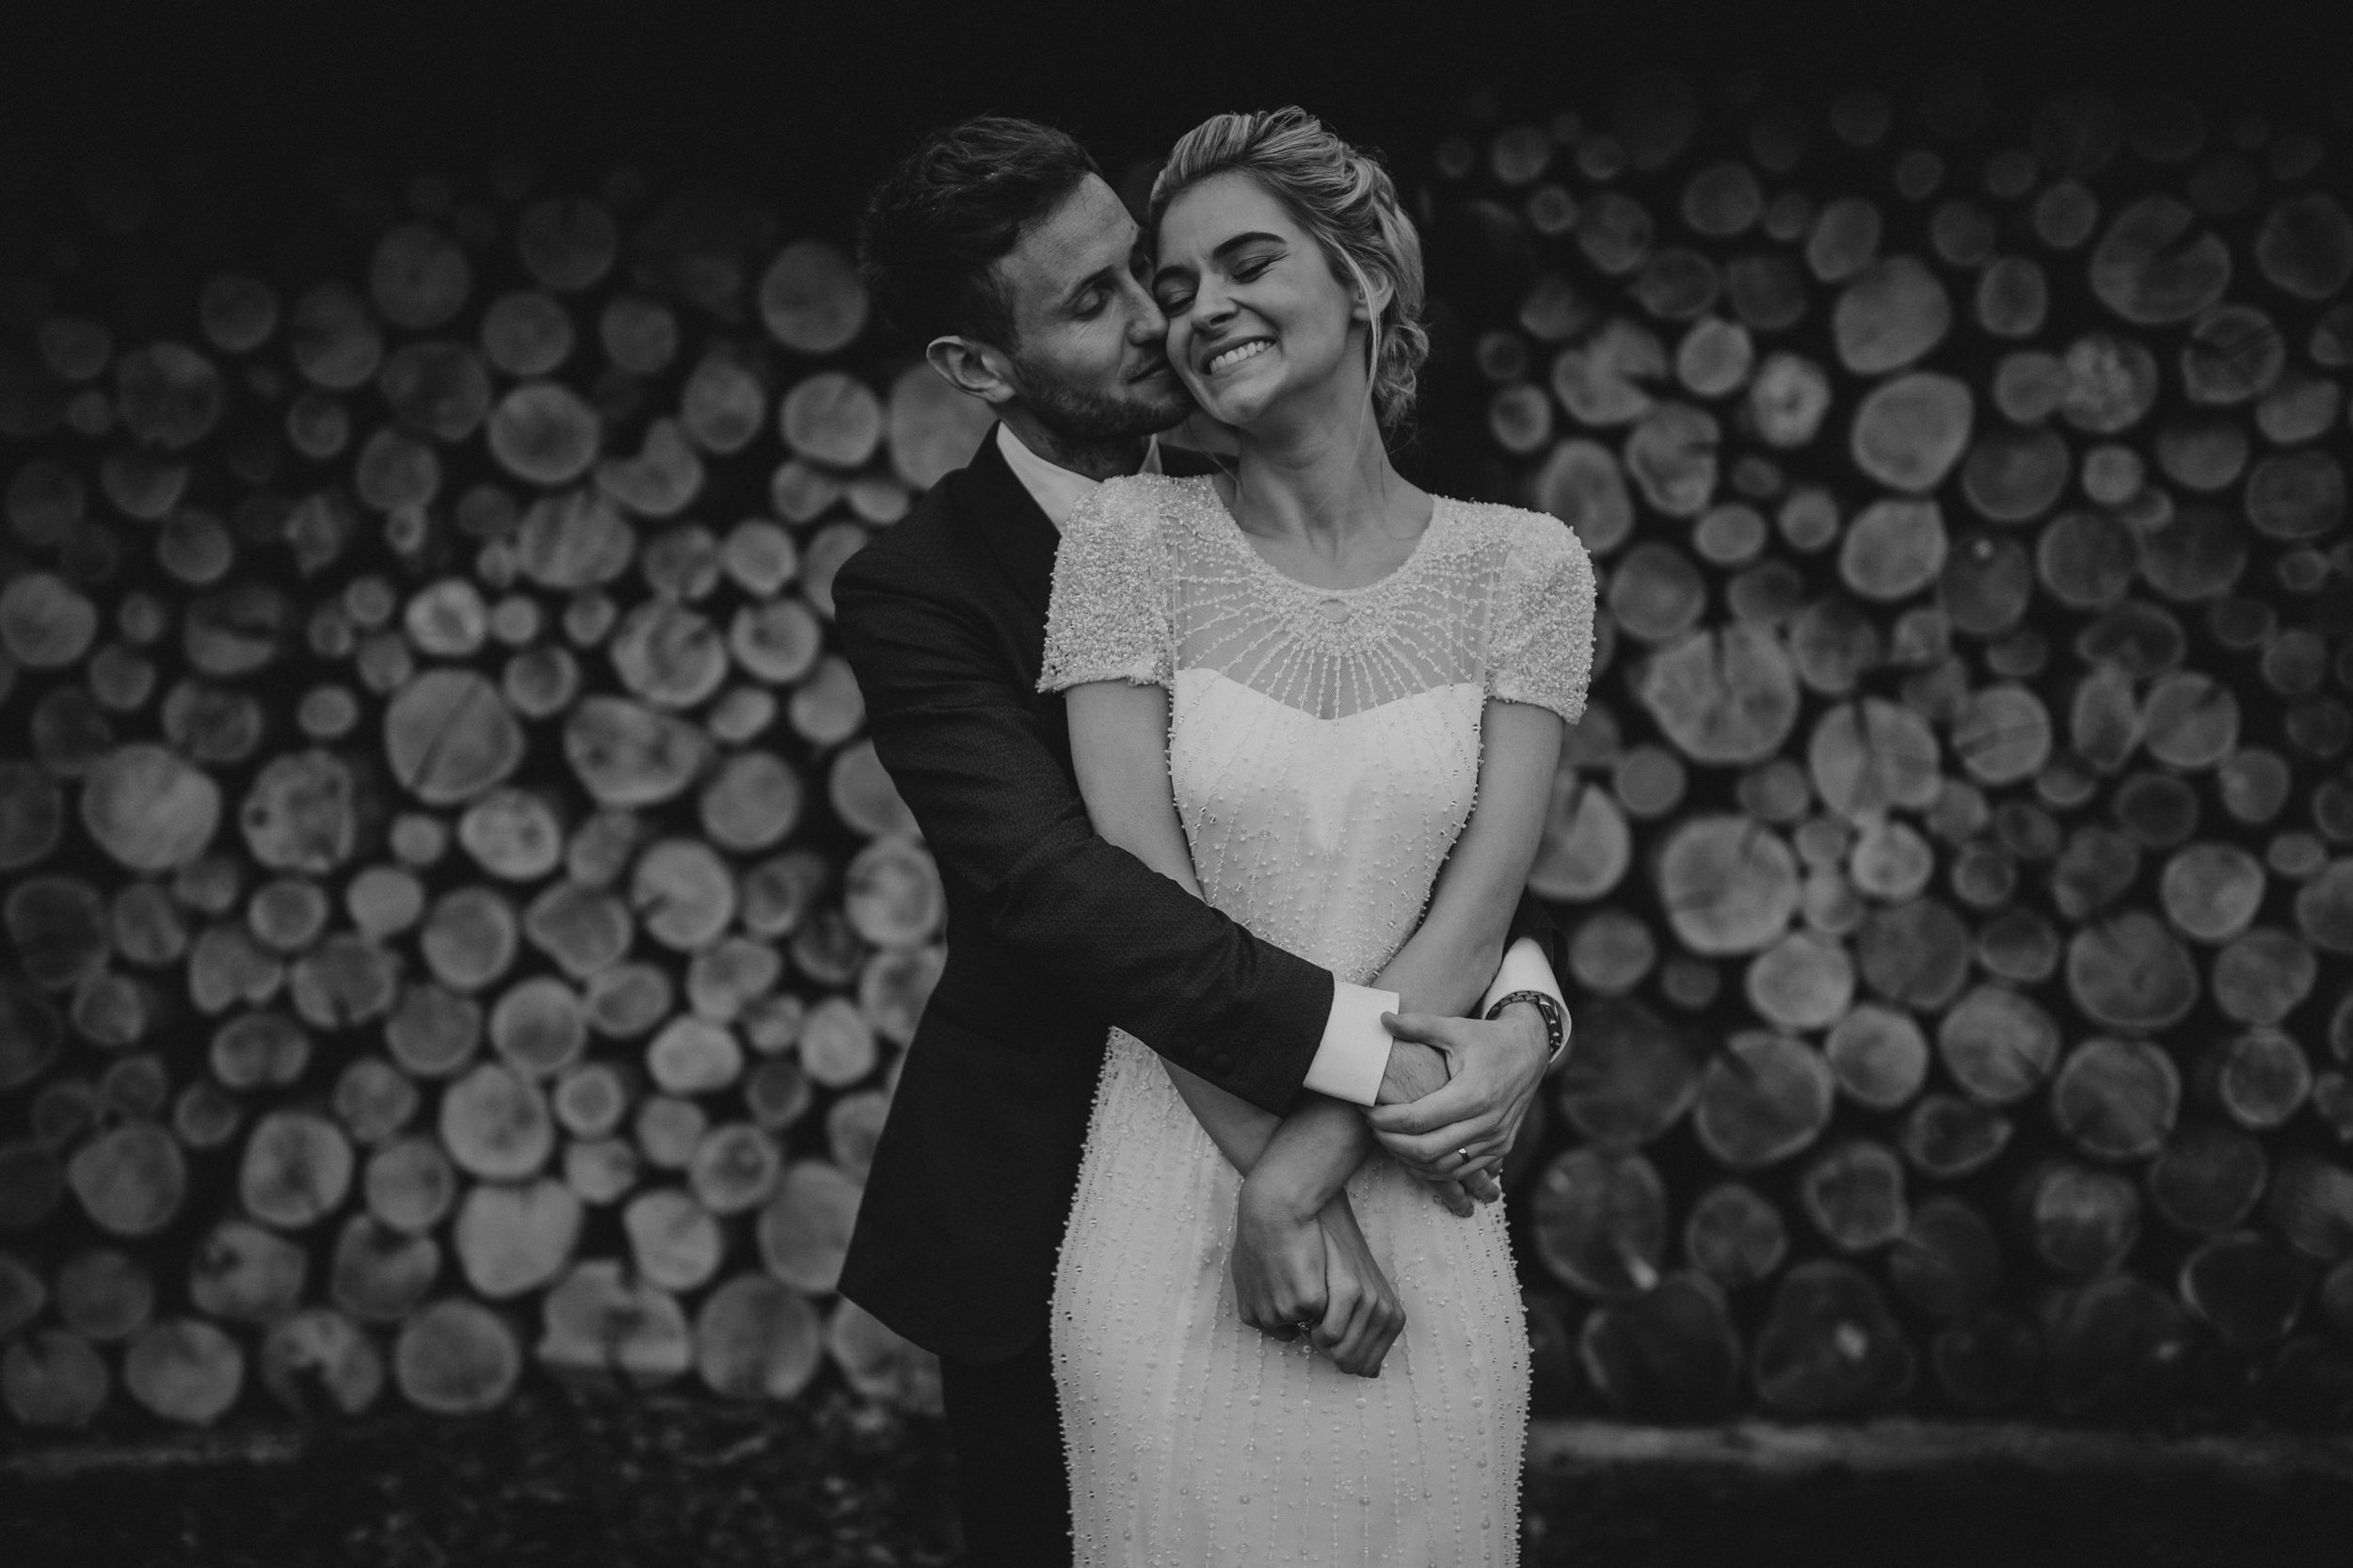 London_wedding_photographer_gione_da_silva_carelle_paul184.jpg